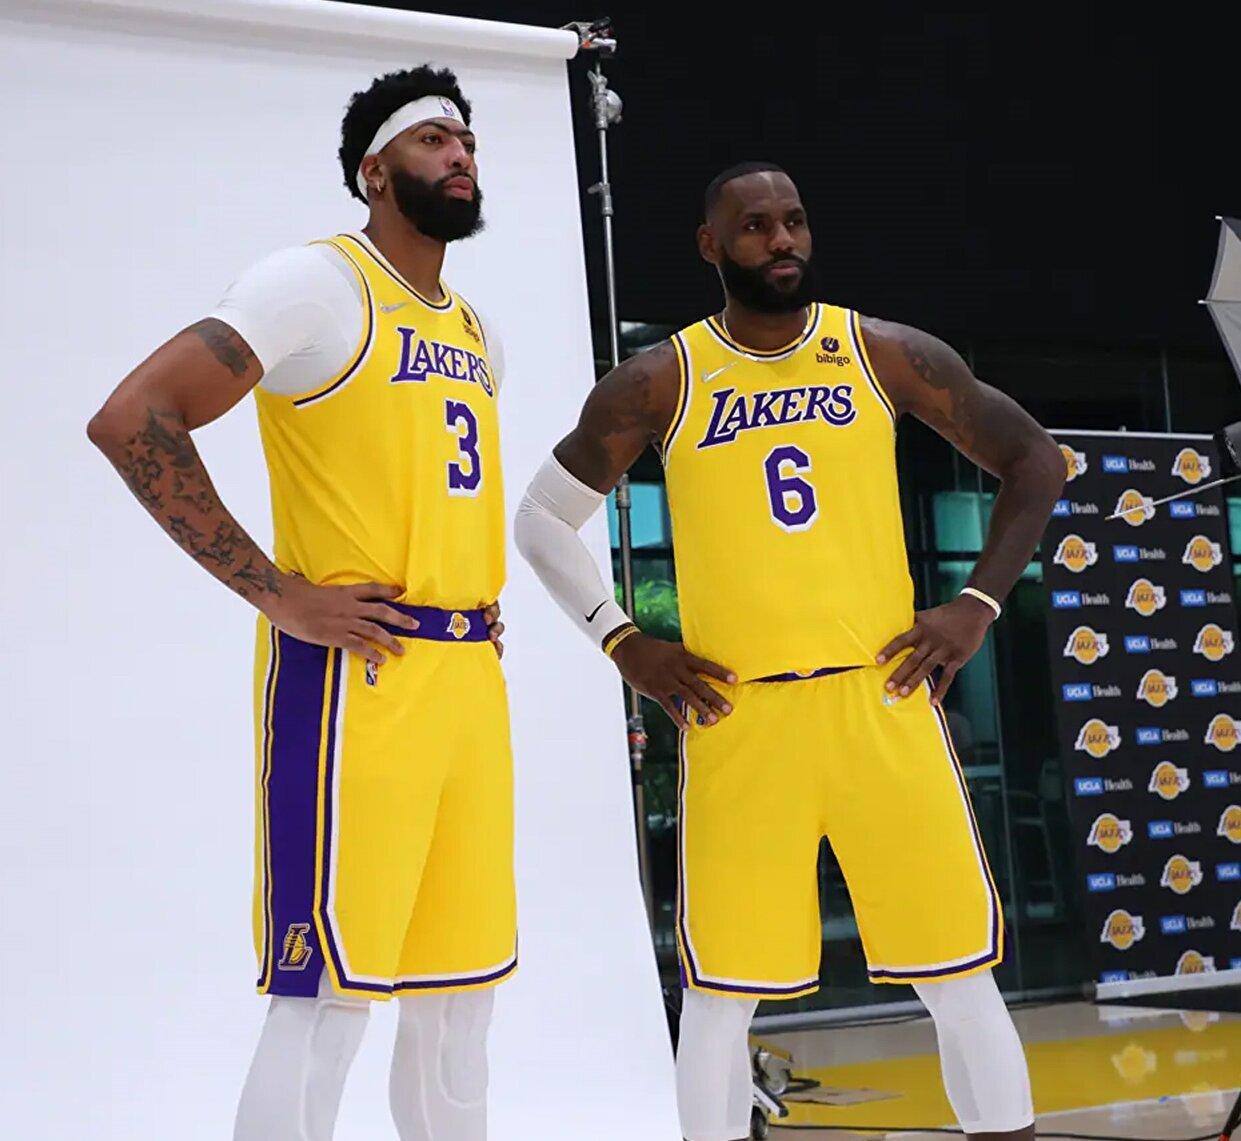 NBAbasliyorBLOG